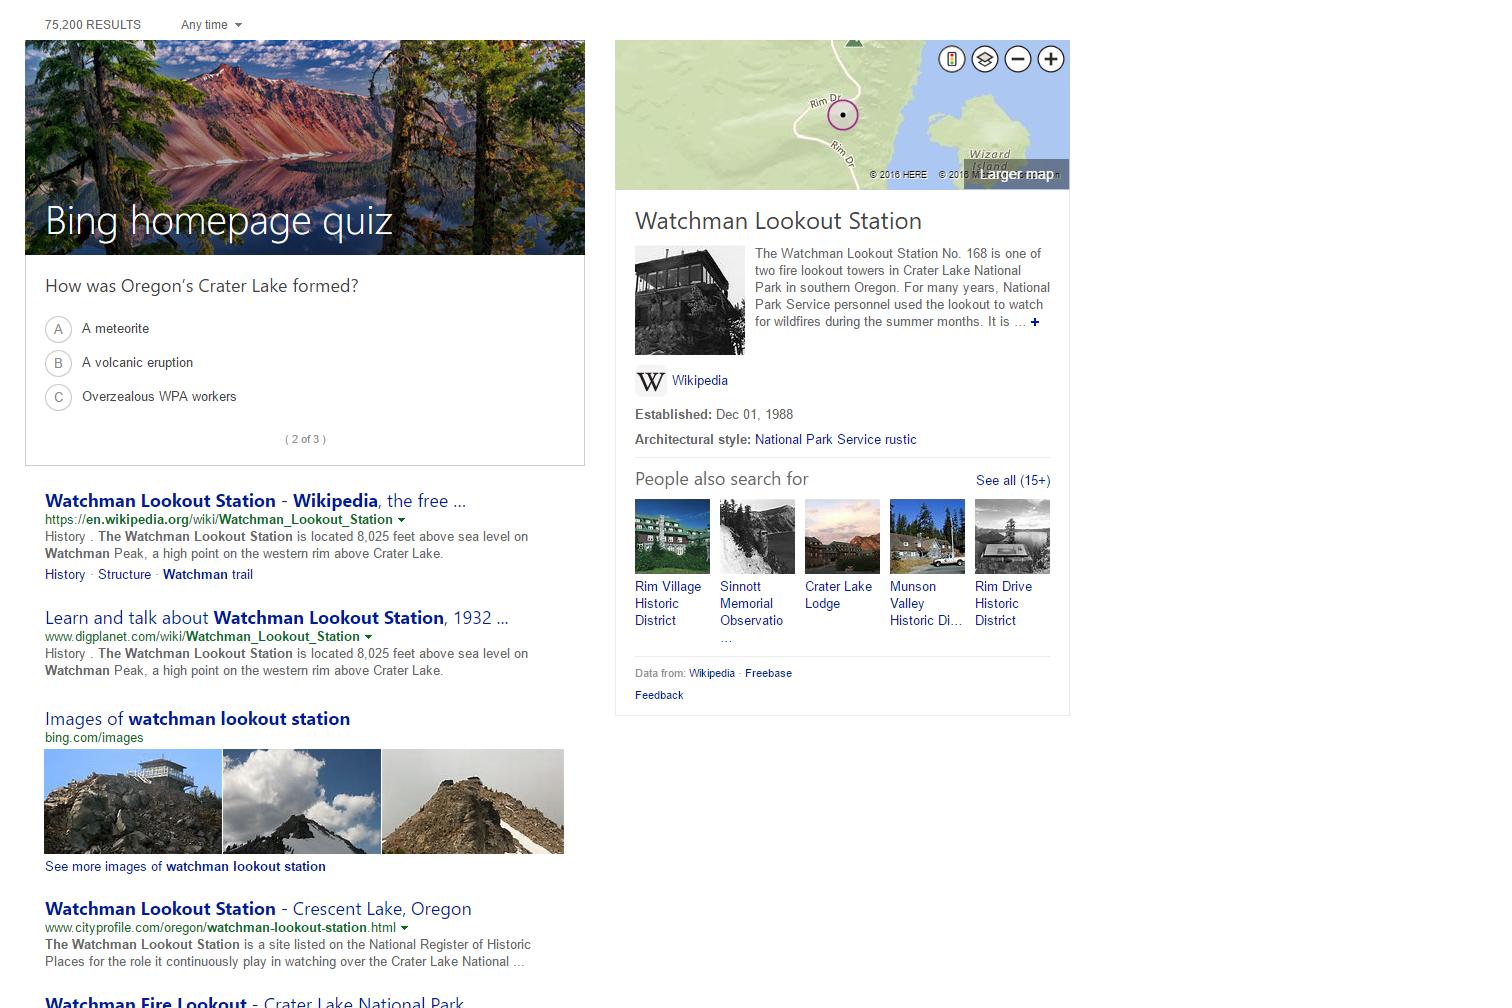 How to use Bing homepage daily quiz - MSPoweruser